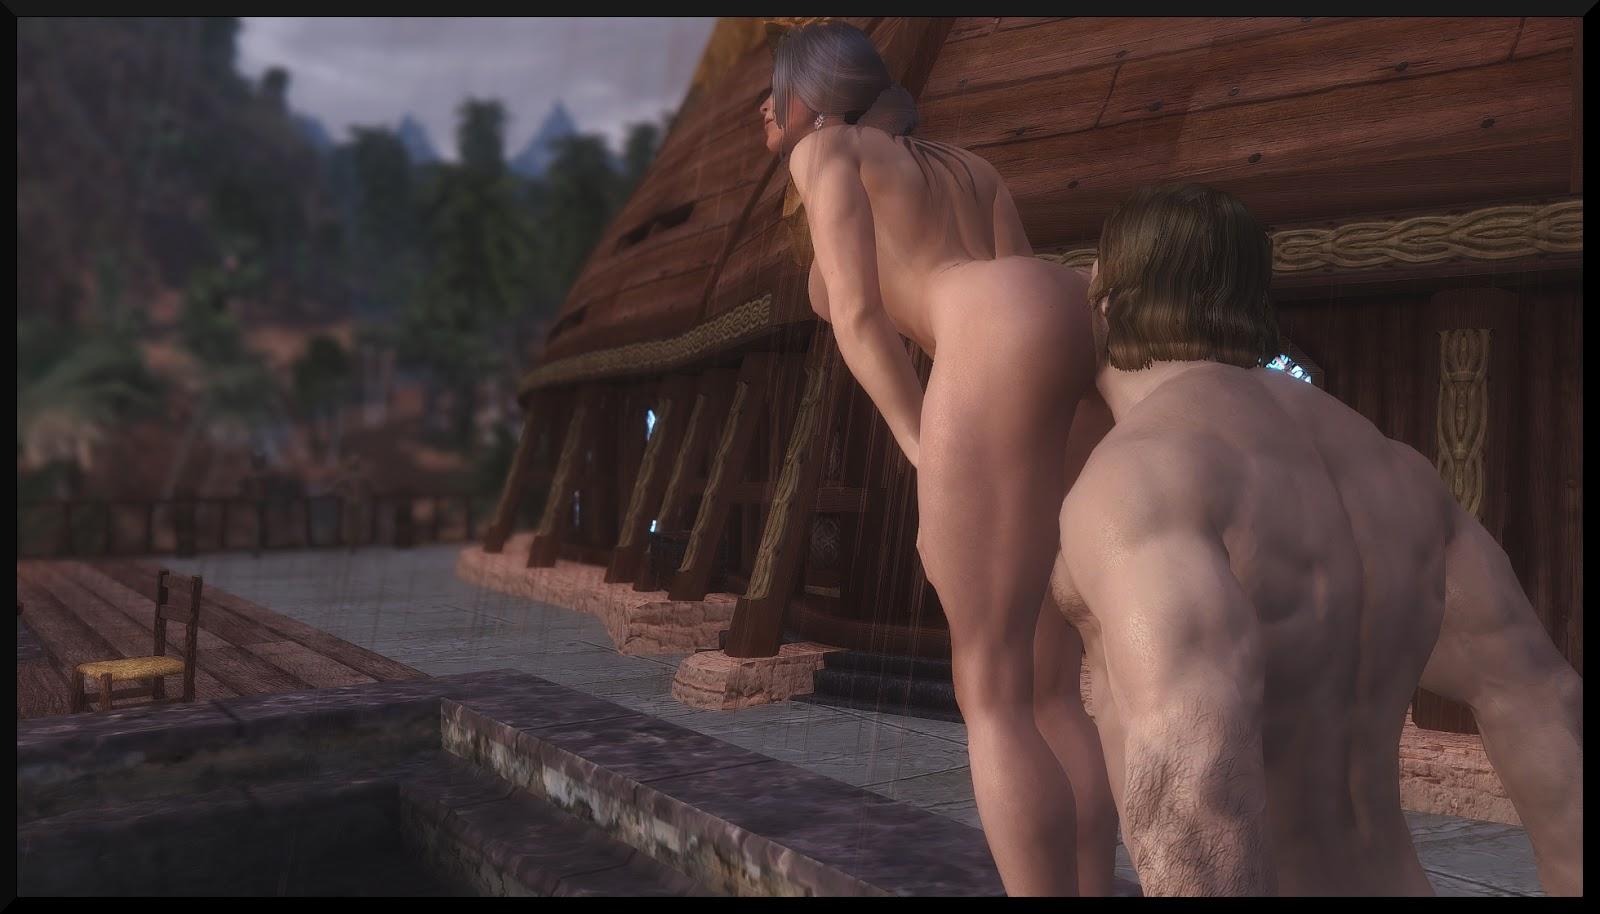 porno-krasivoe-kachestvennoe-foto